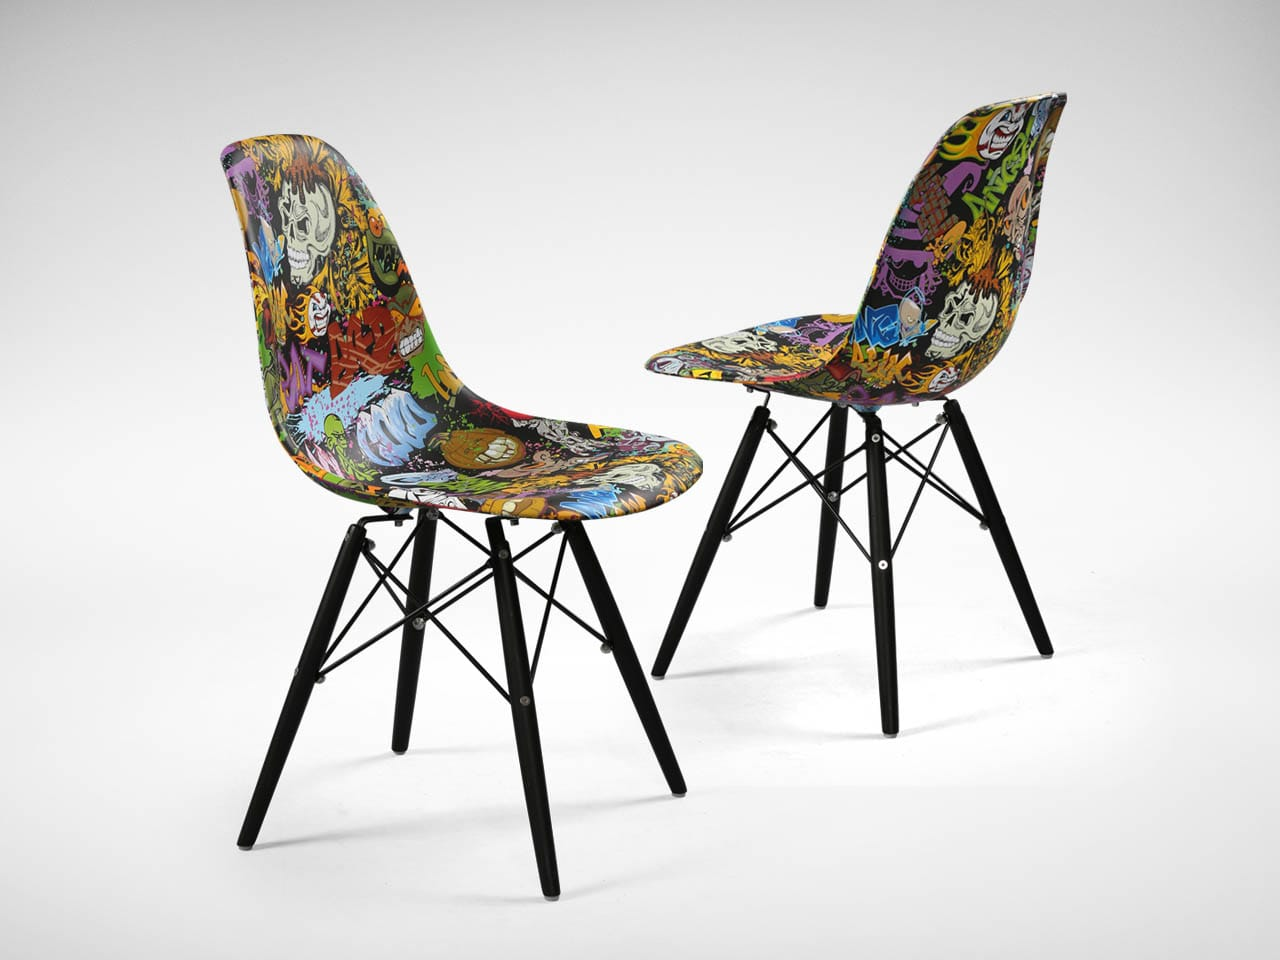 Argo Graffiti Black Tower Chair Comfort Design The